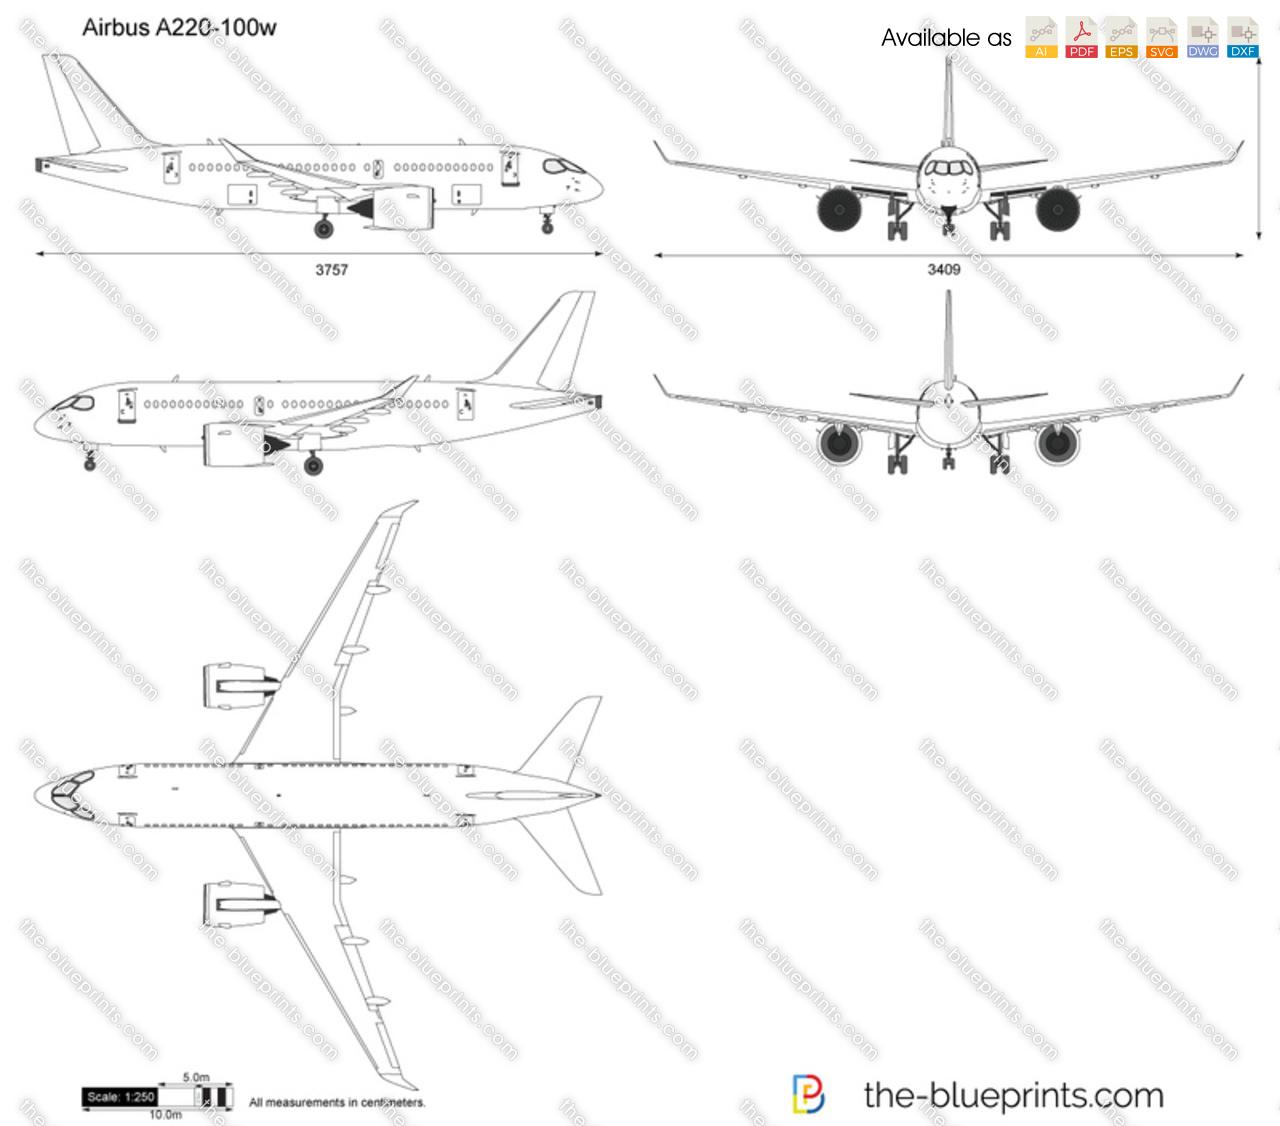 Airbus A220-100w